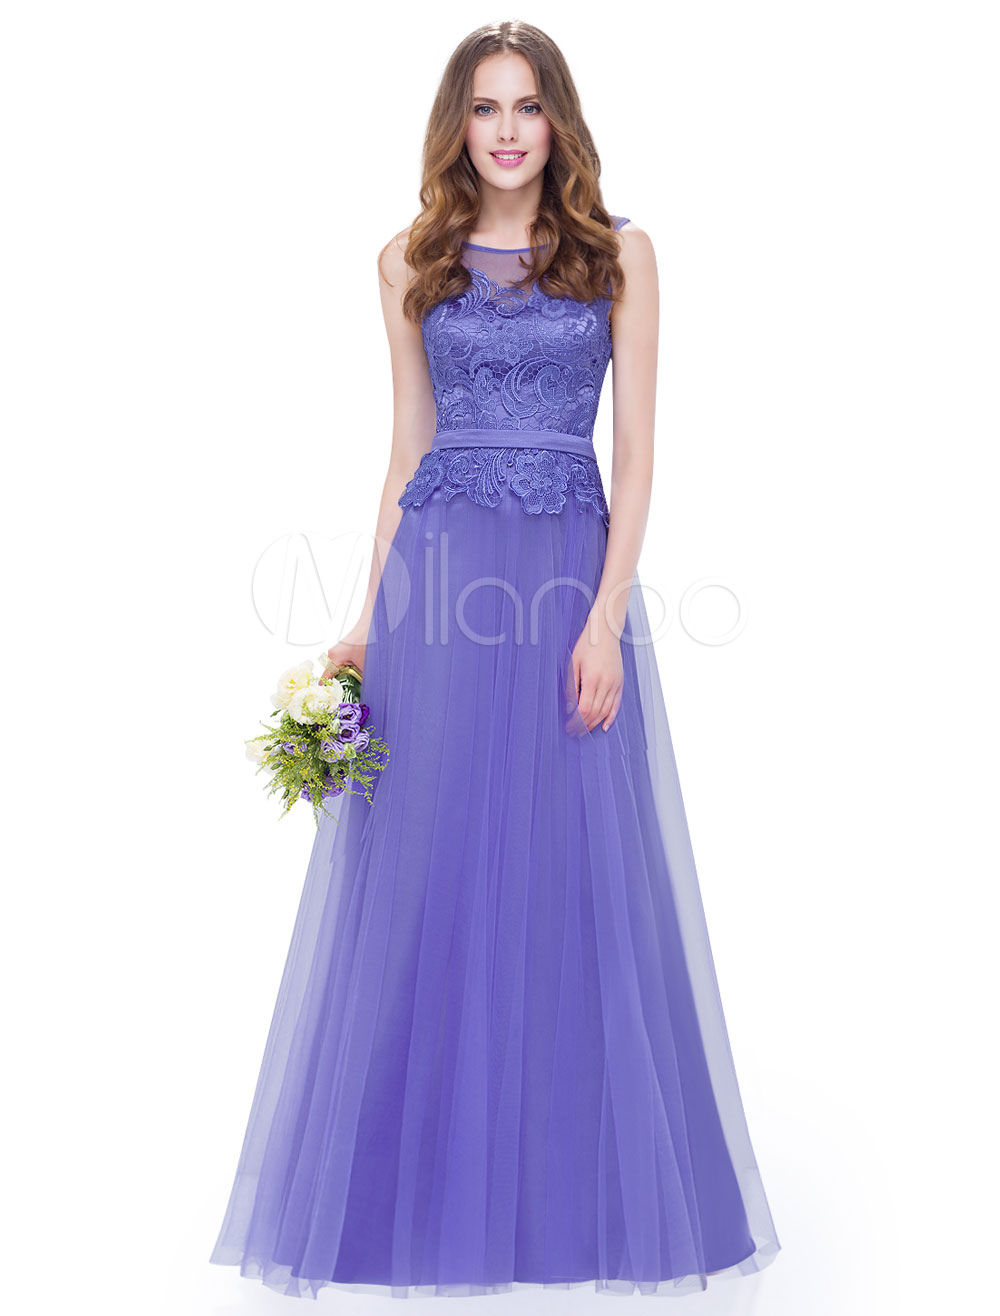 Violet Bridesmaid Dresses Long Lace Tulle A Line Peplum Wedding ...